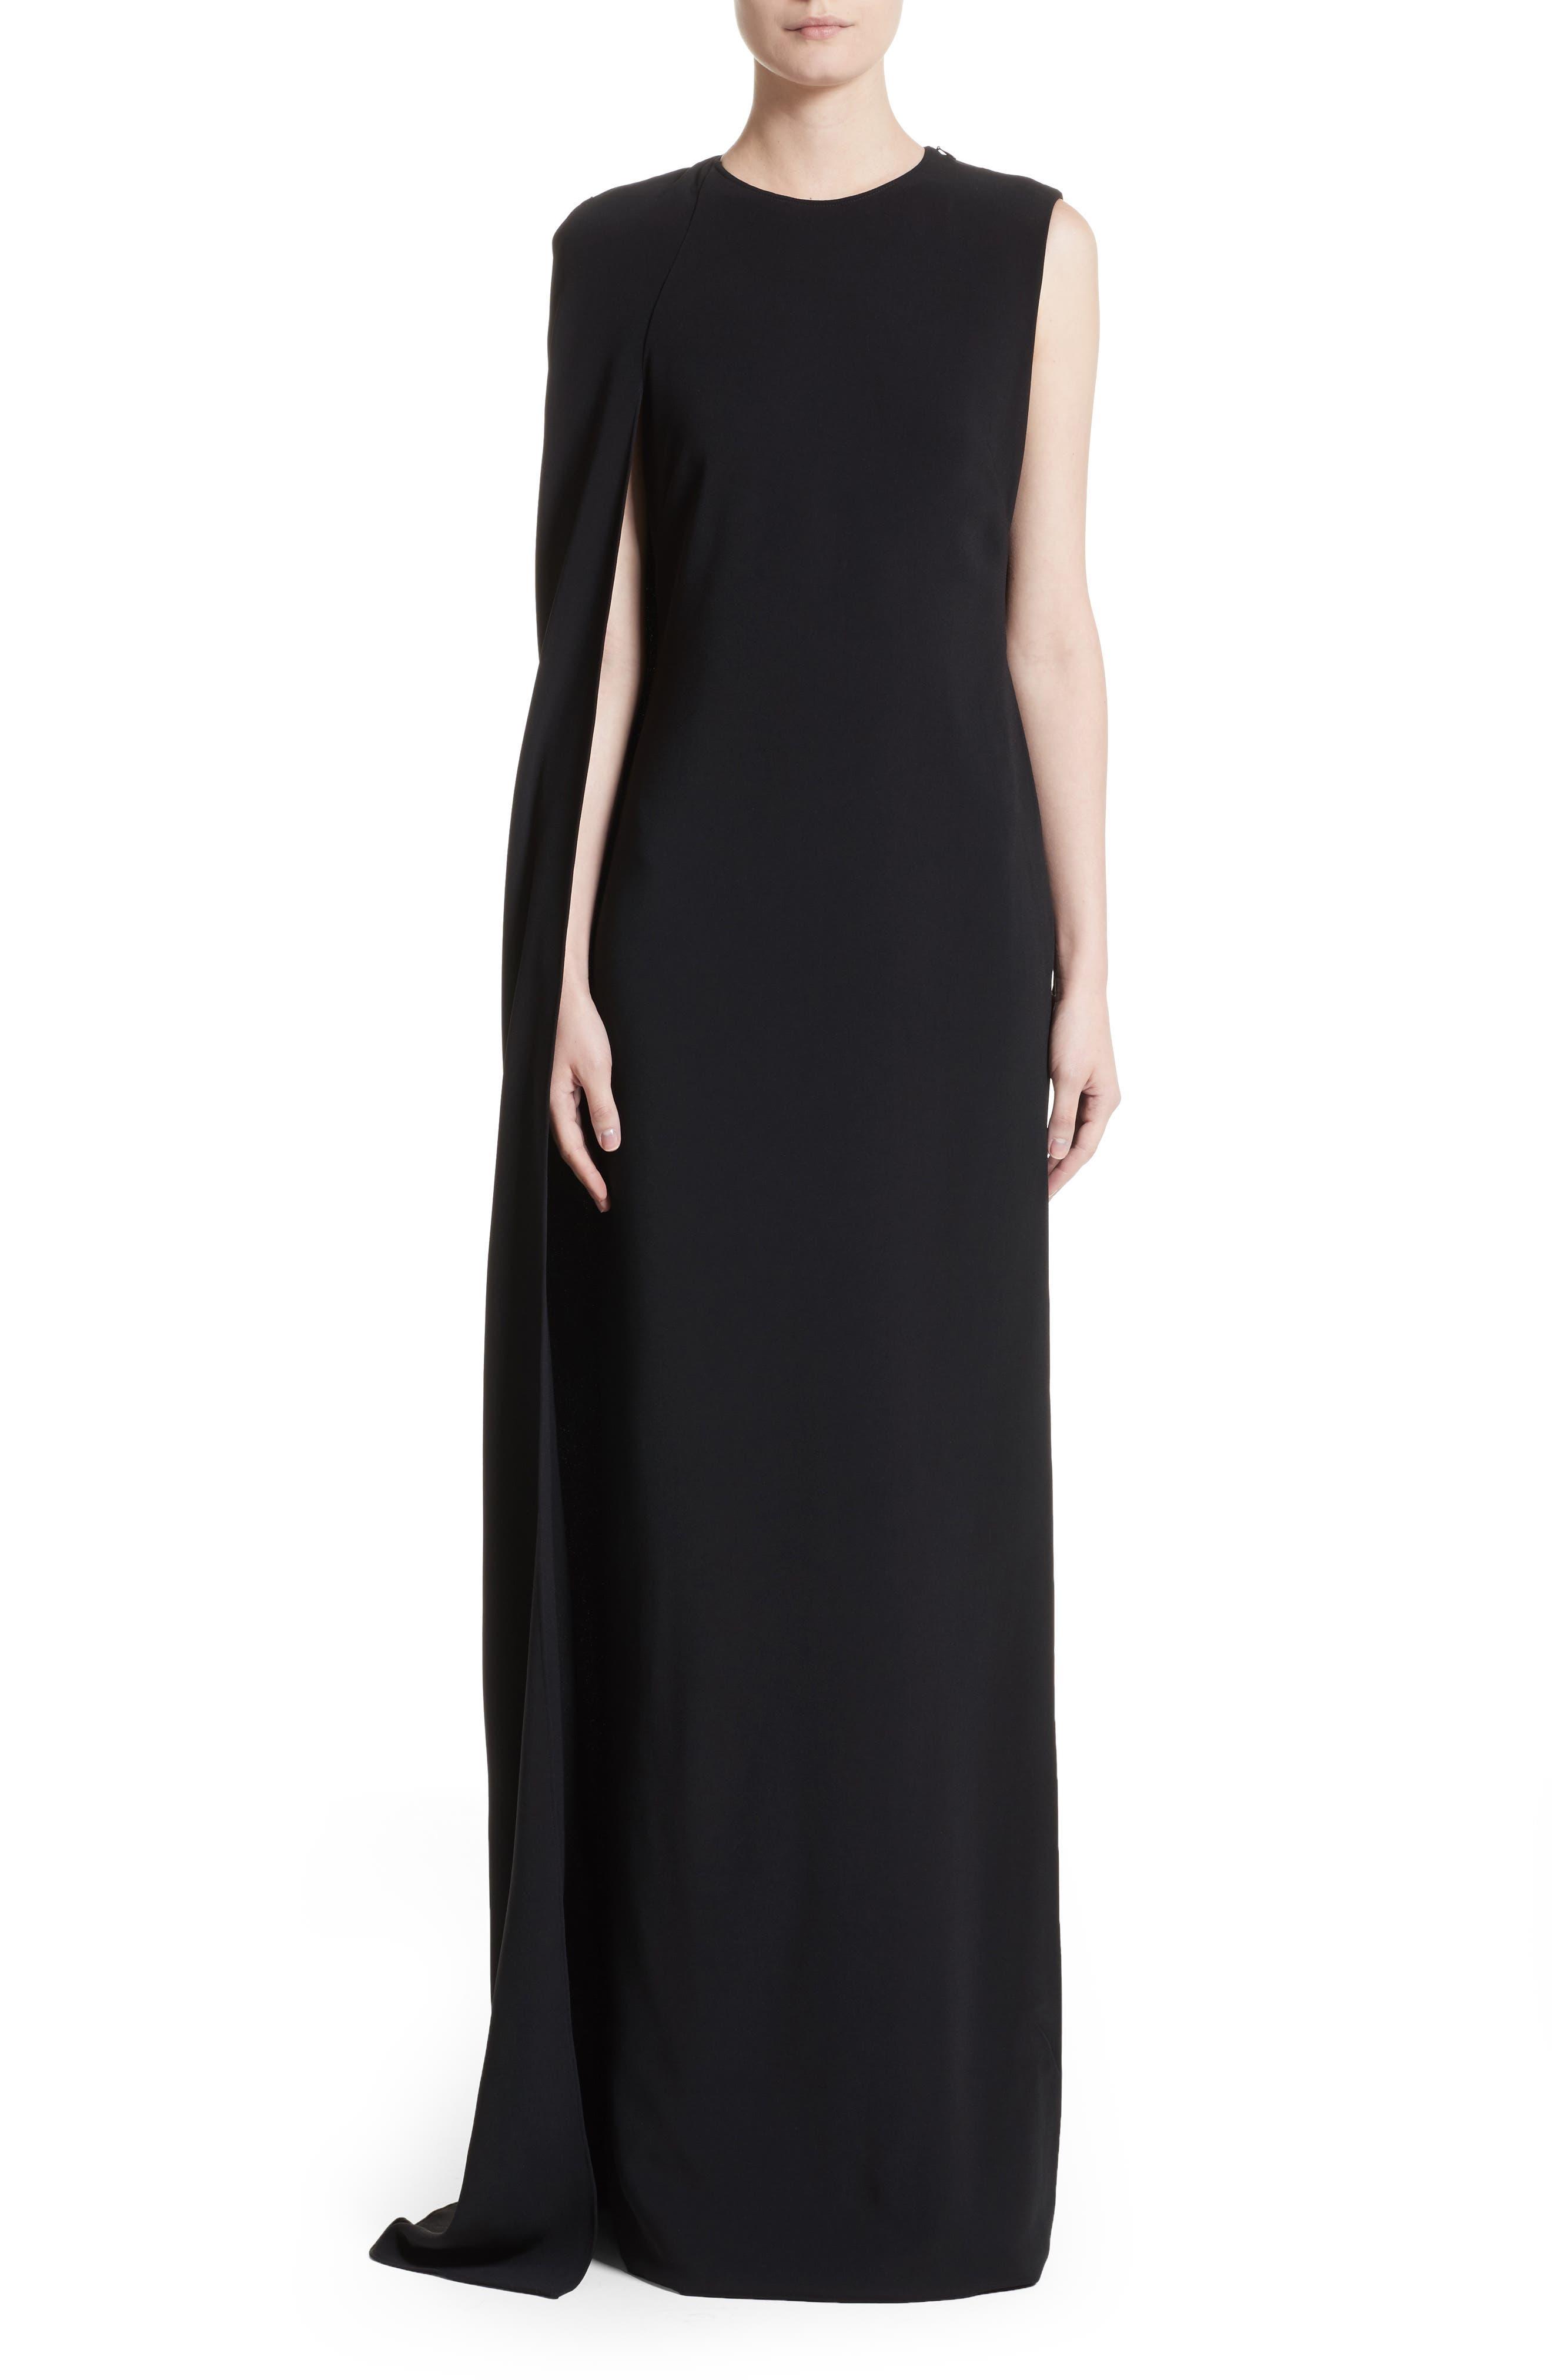 Main Image - Stella McCartney Stretch Cady One-Shoulder Cape Gown